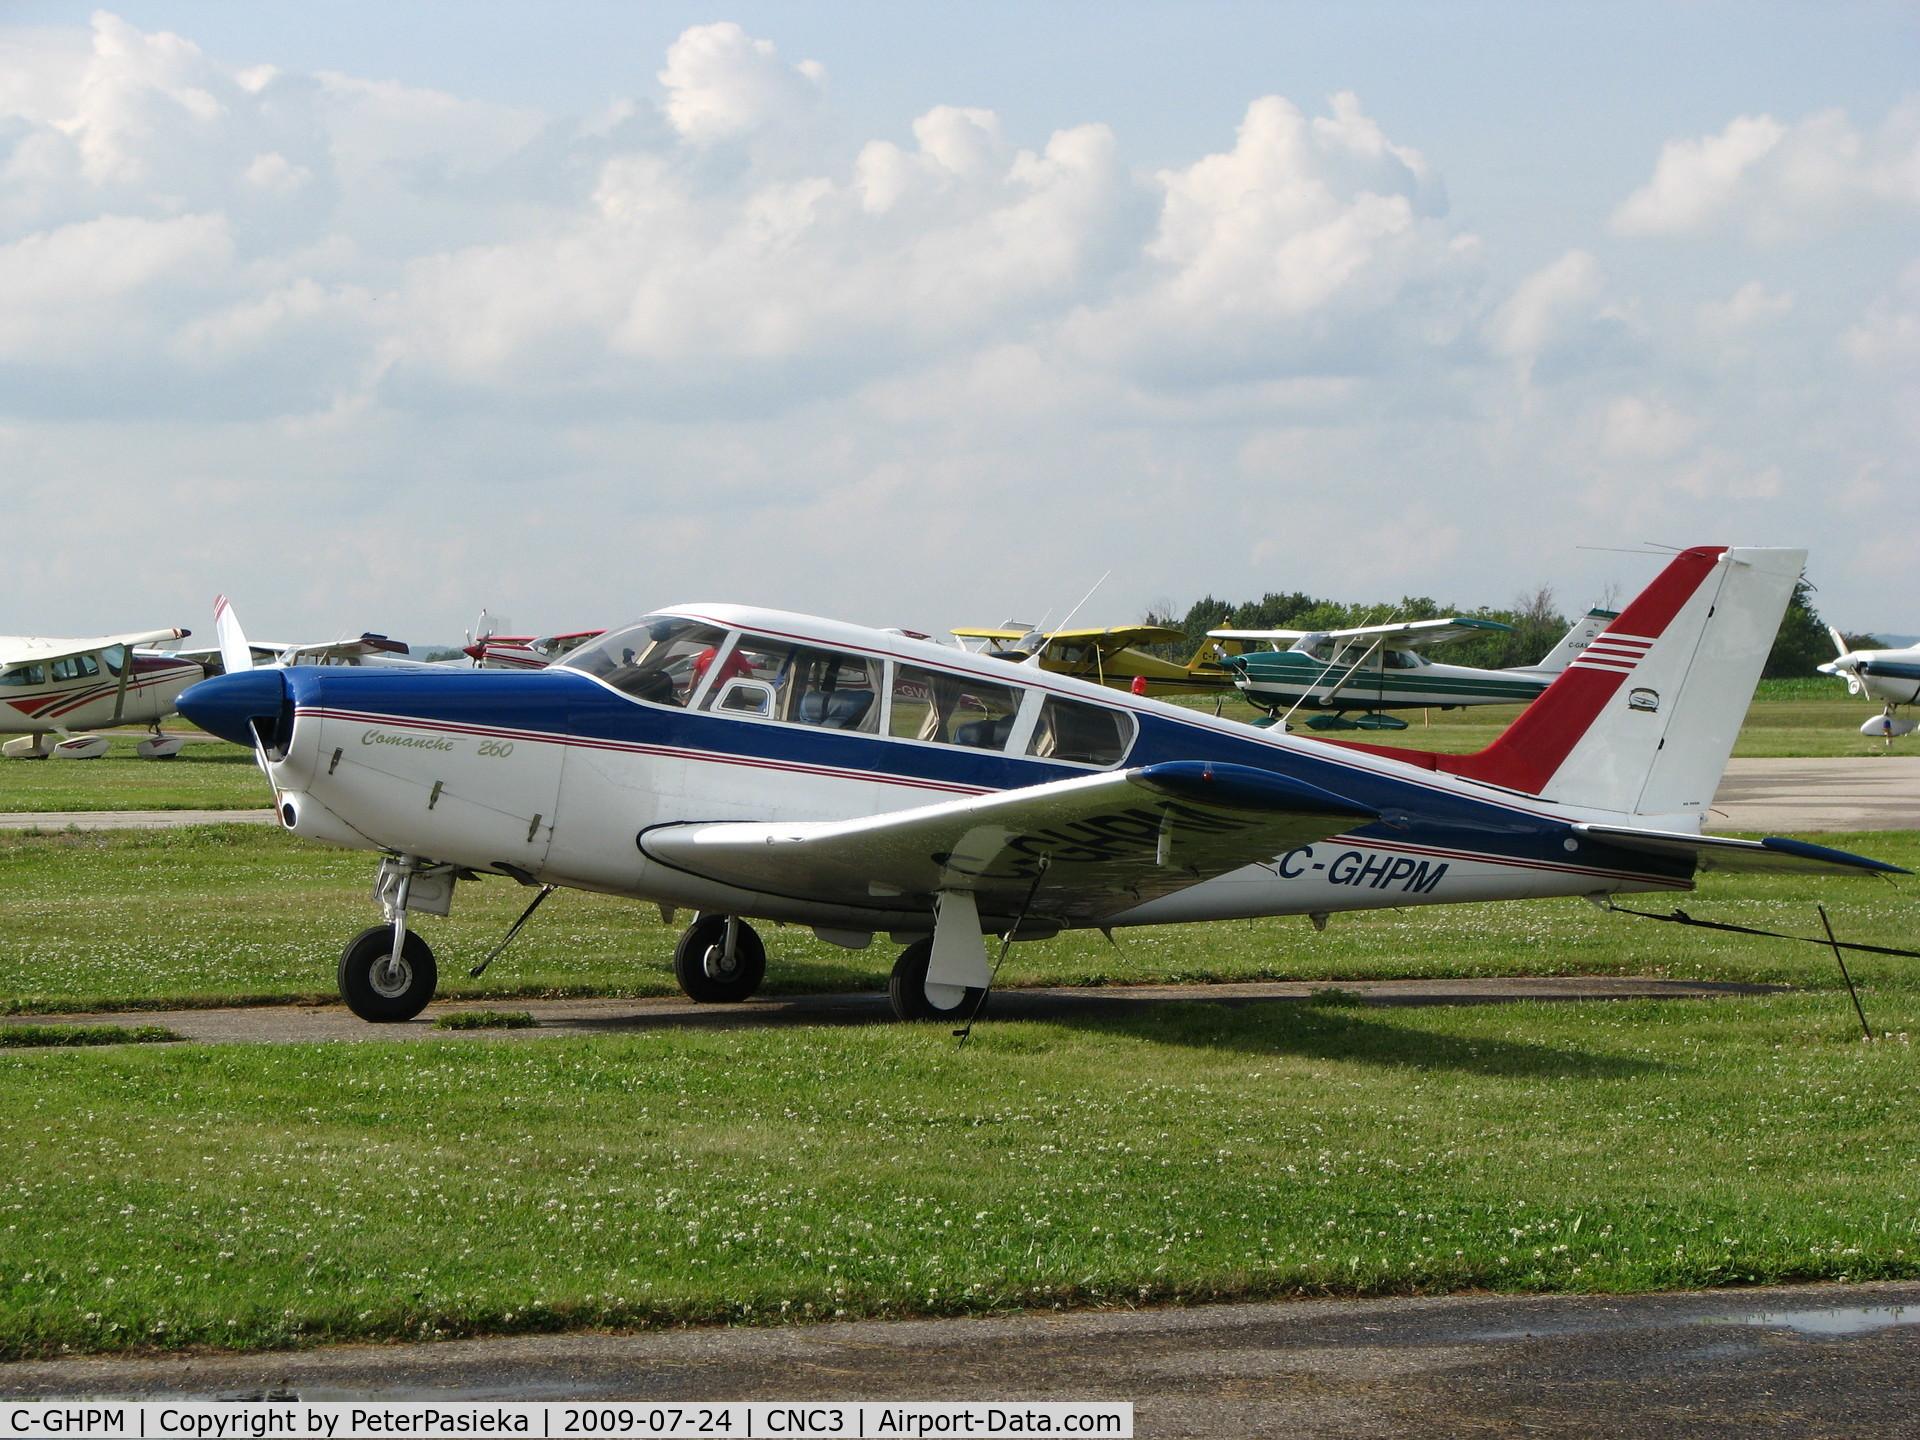 C-GHPM, 1966 Piper PA-24-260 Comanche B C/N 24-4644, @ Brampton Airport